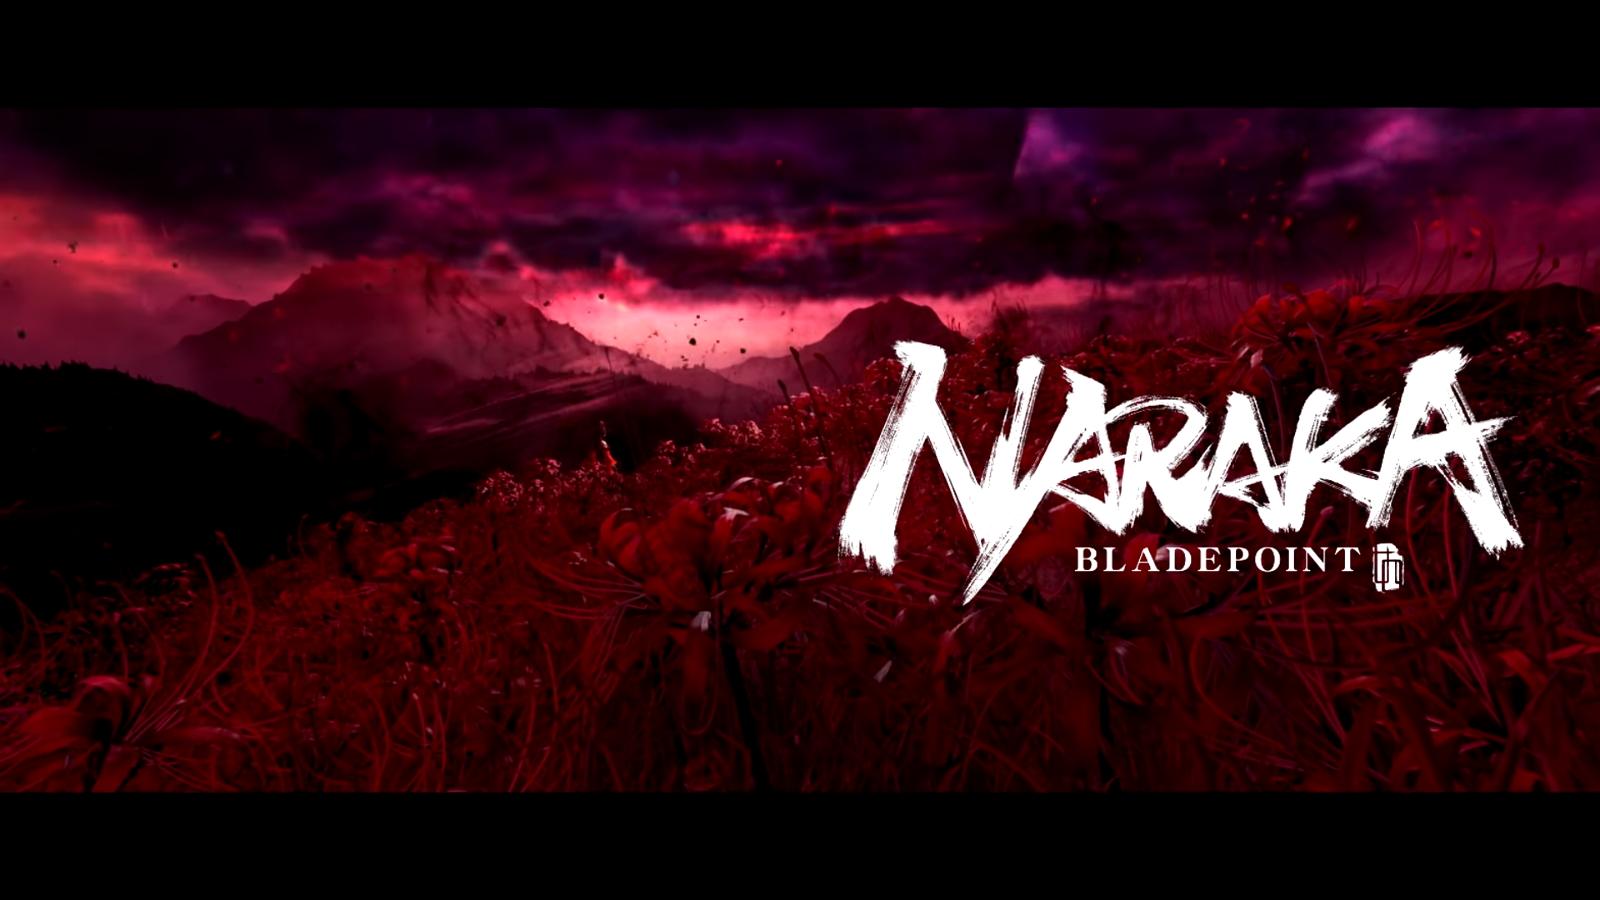 Annunciato NARAKA: BLADEPOINT tramite un trailer